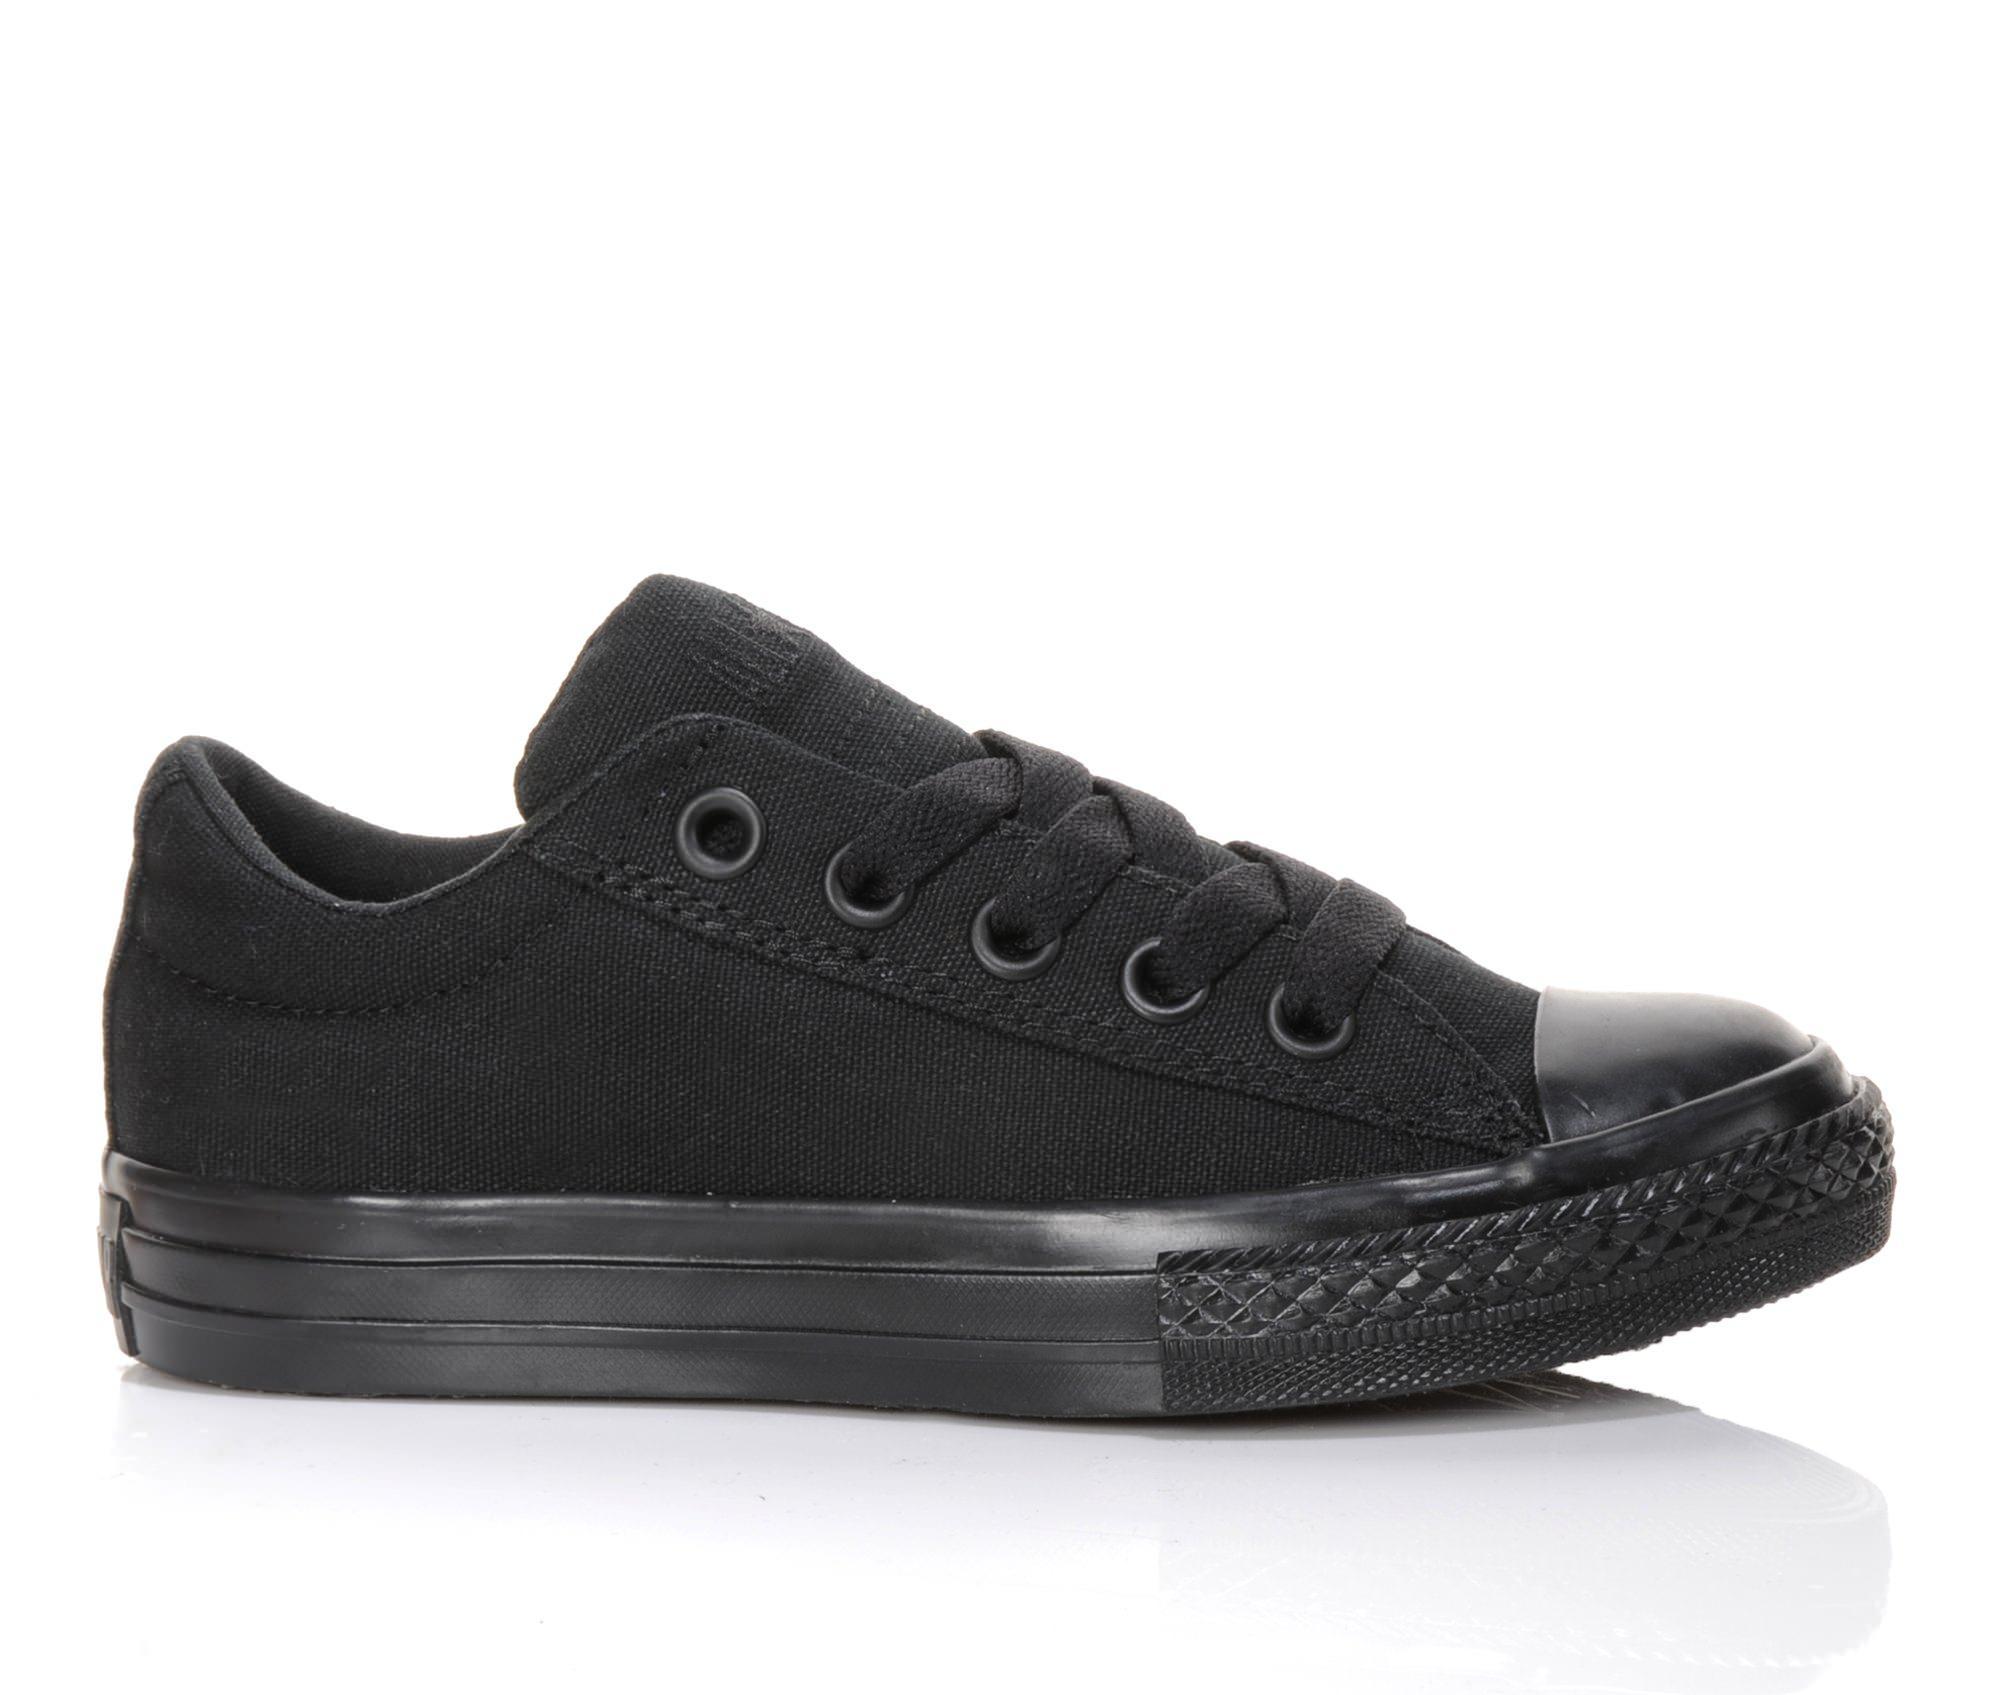 Girls' Converse Chuck Taylor All Star Street Ox Sneakers (Black)